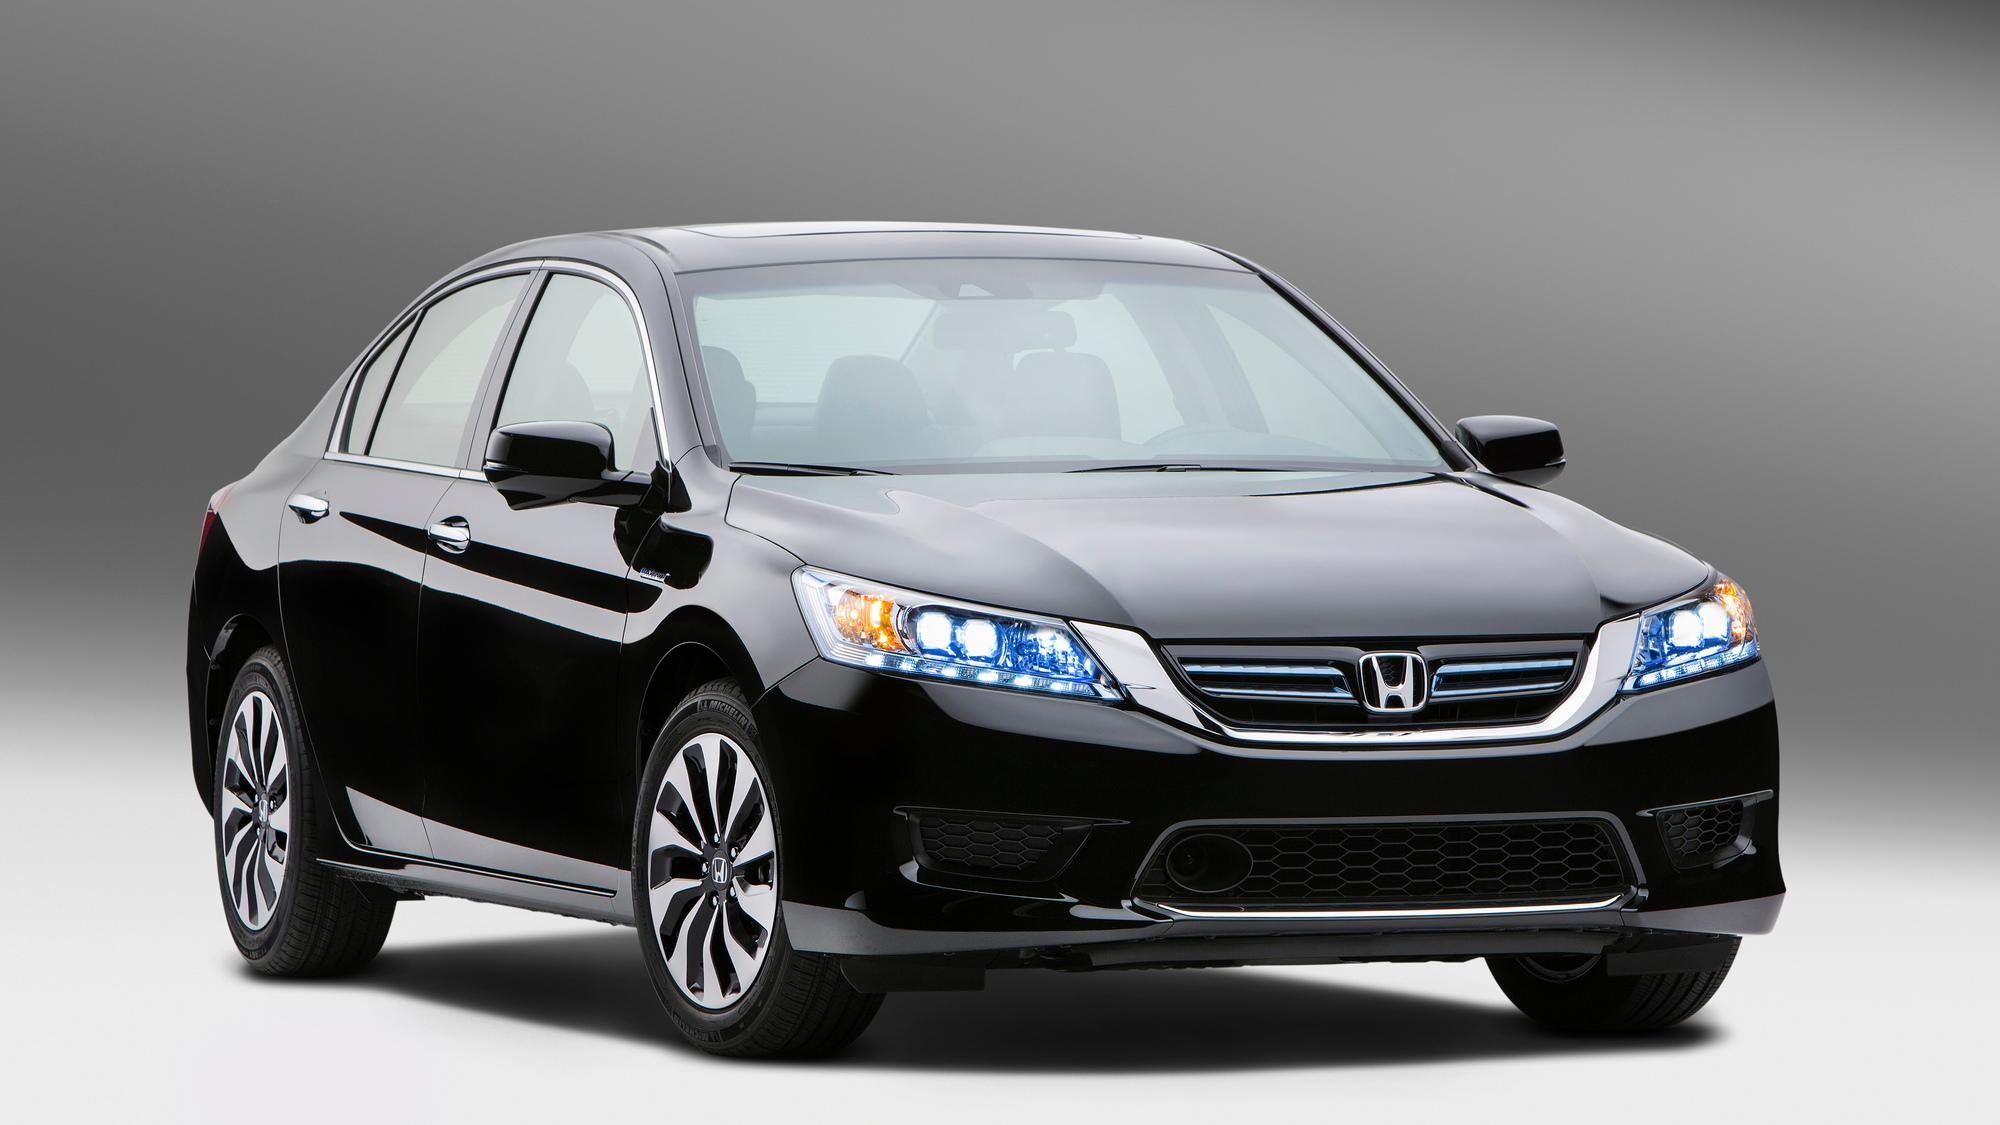 2014 Honda Accord Hybrid Gas Mileage 47 Mpg Combined